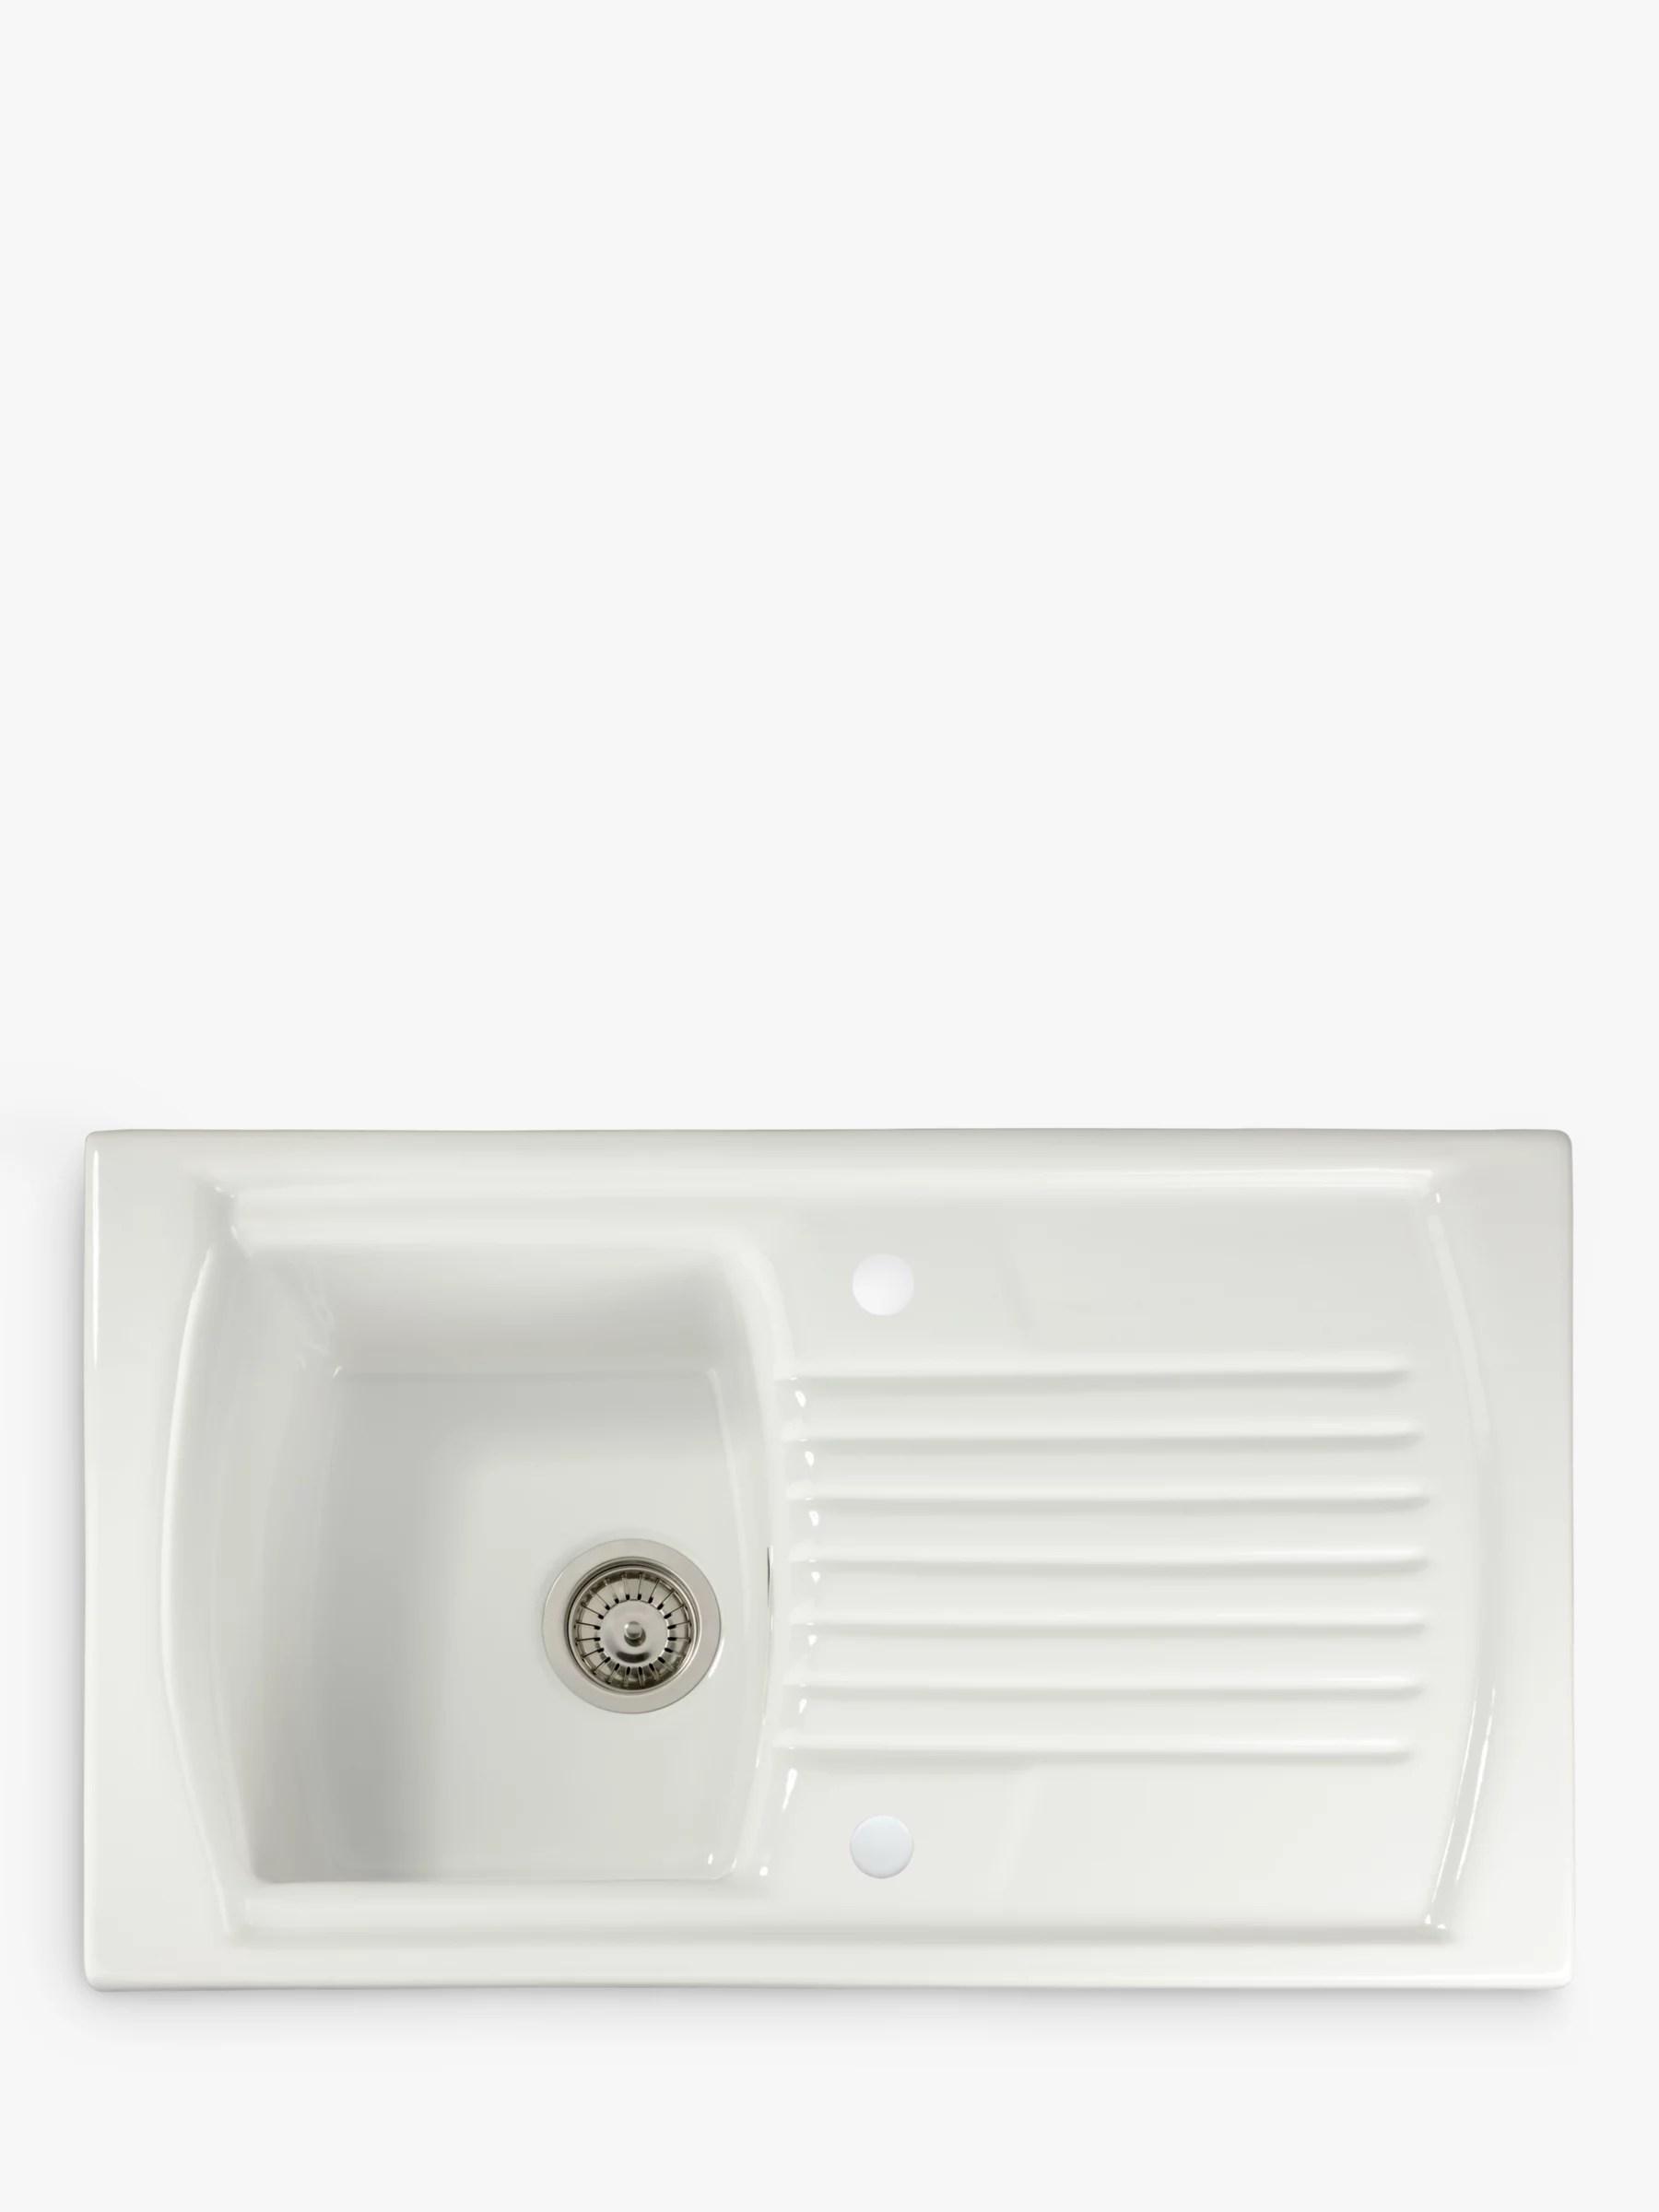 john lewis partners single bowl inset ceramic kitchen sink drainer white